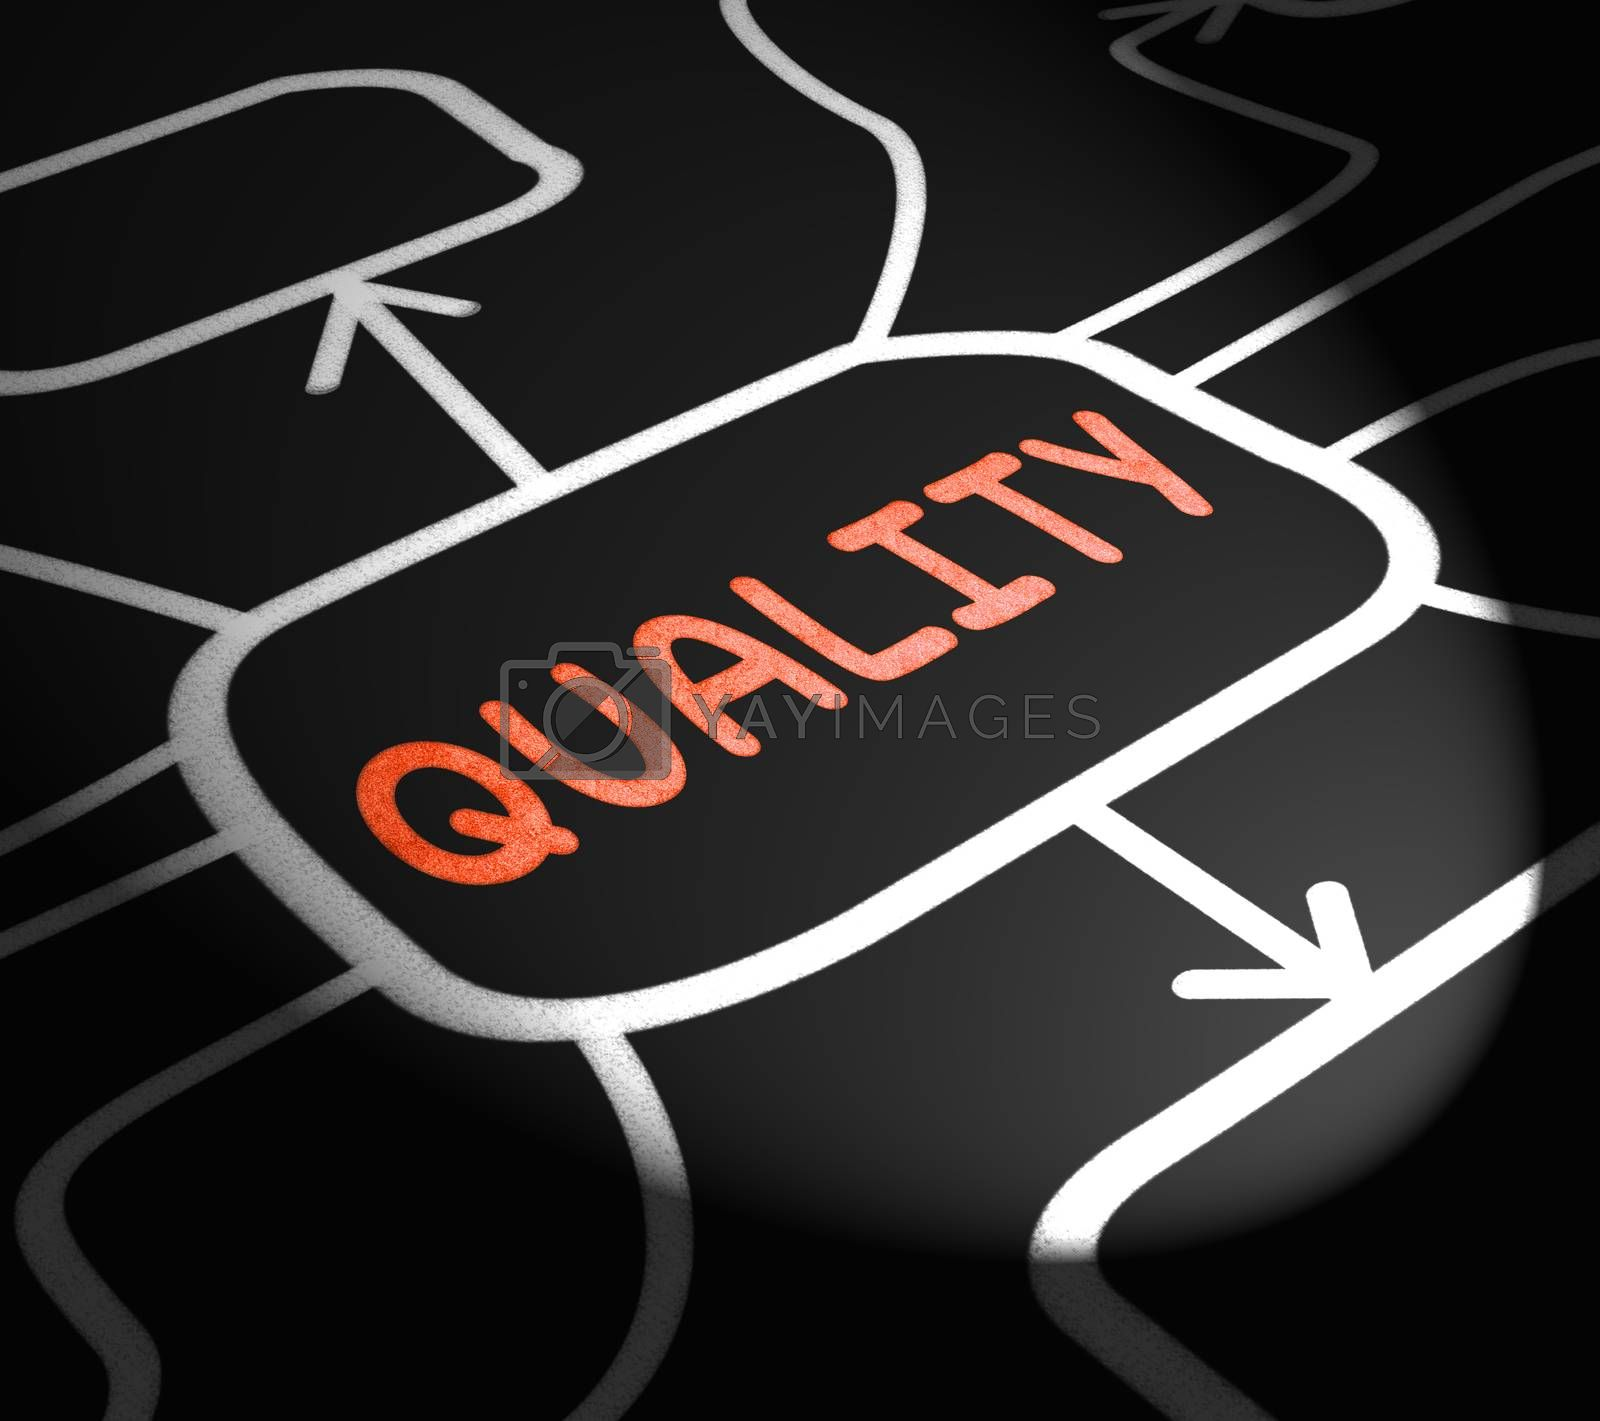 Quality Arrows Shows Excellent Or Premium Condition by stuartmiles